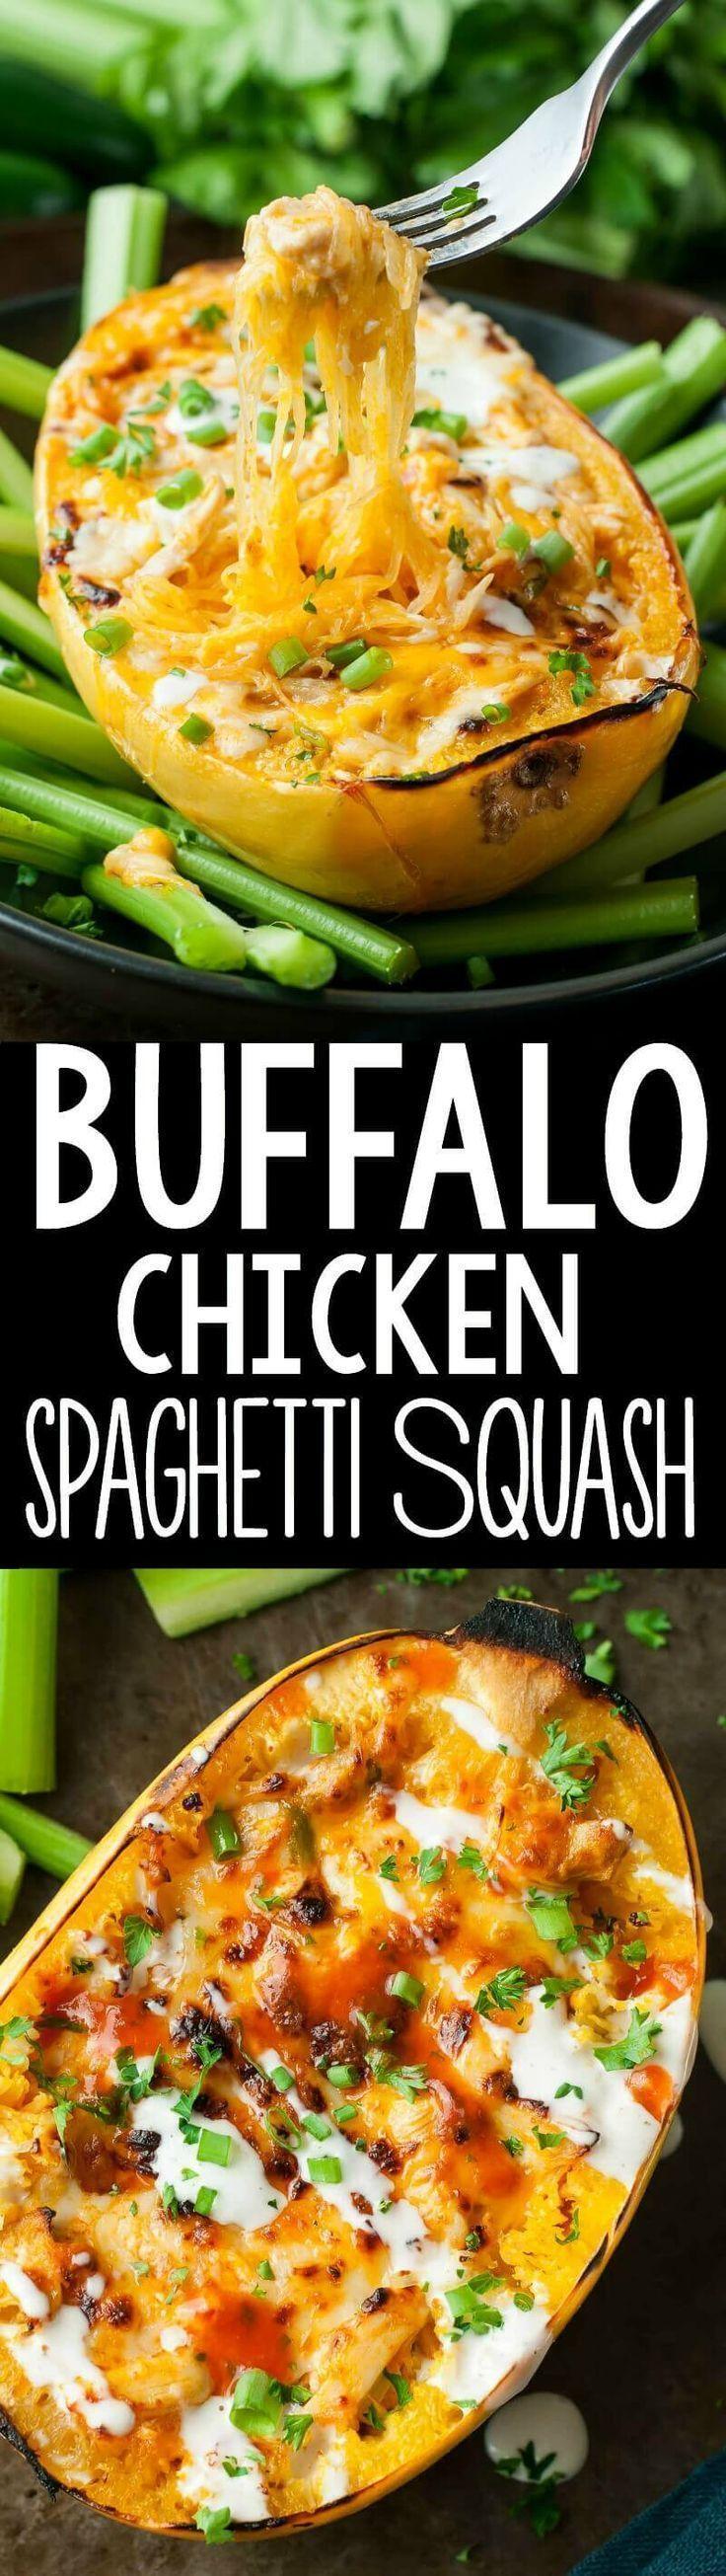 Cheesy Buffalo Chicken Spaghetti Squash Bowls Recipe Food Recipes Healthy Recipes Chicken